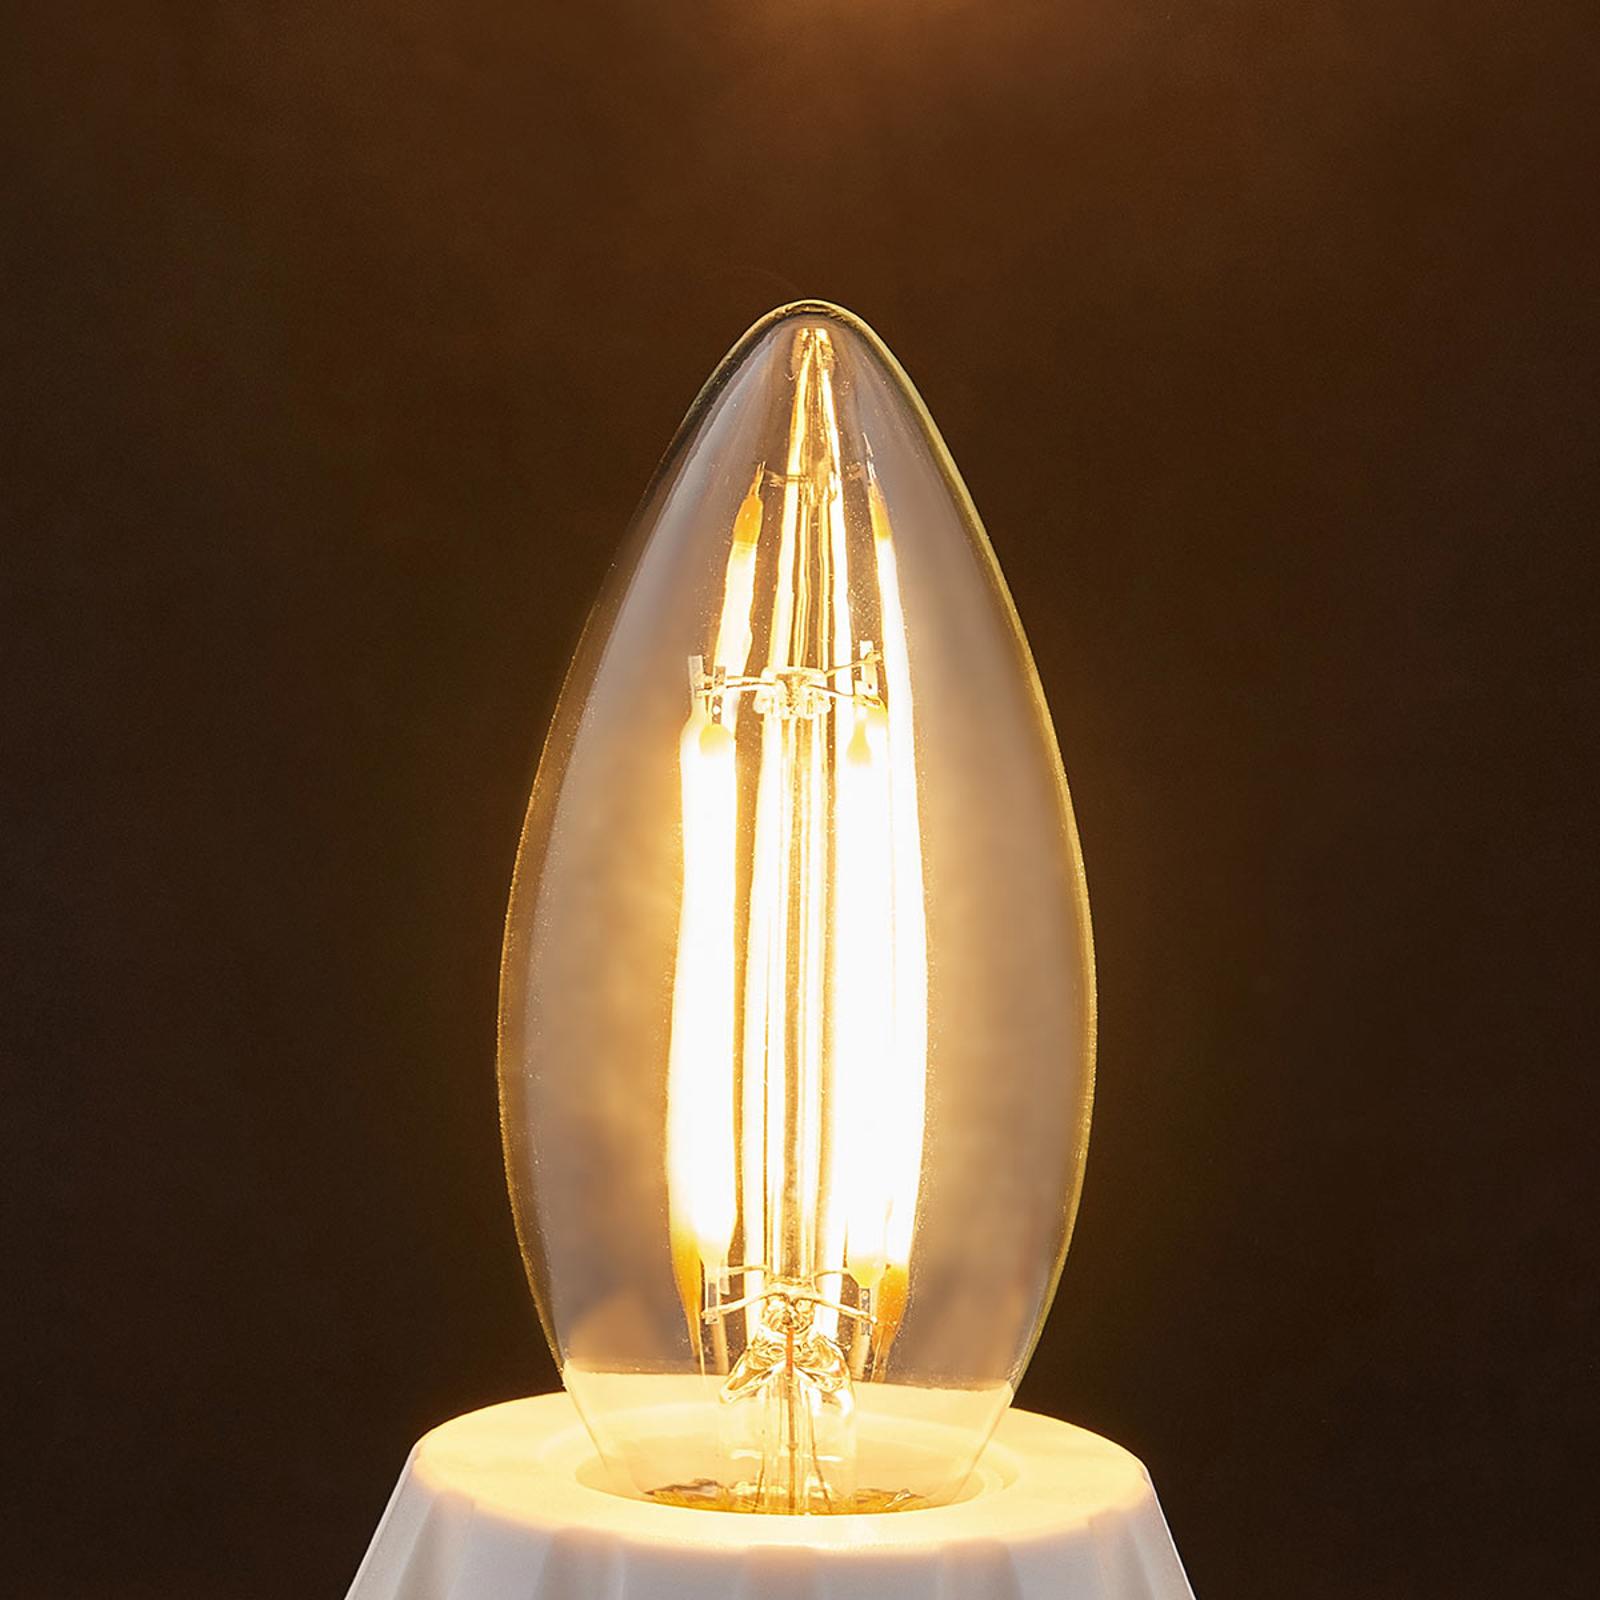 E14 LED-ljuslampa filament 4W, 470 lm, 2 700 K